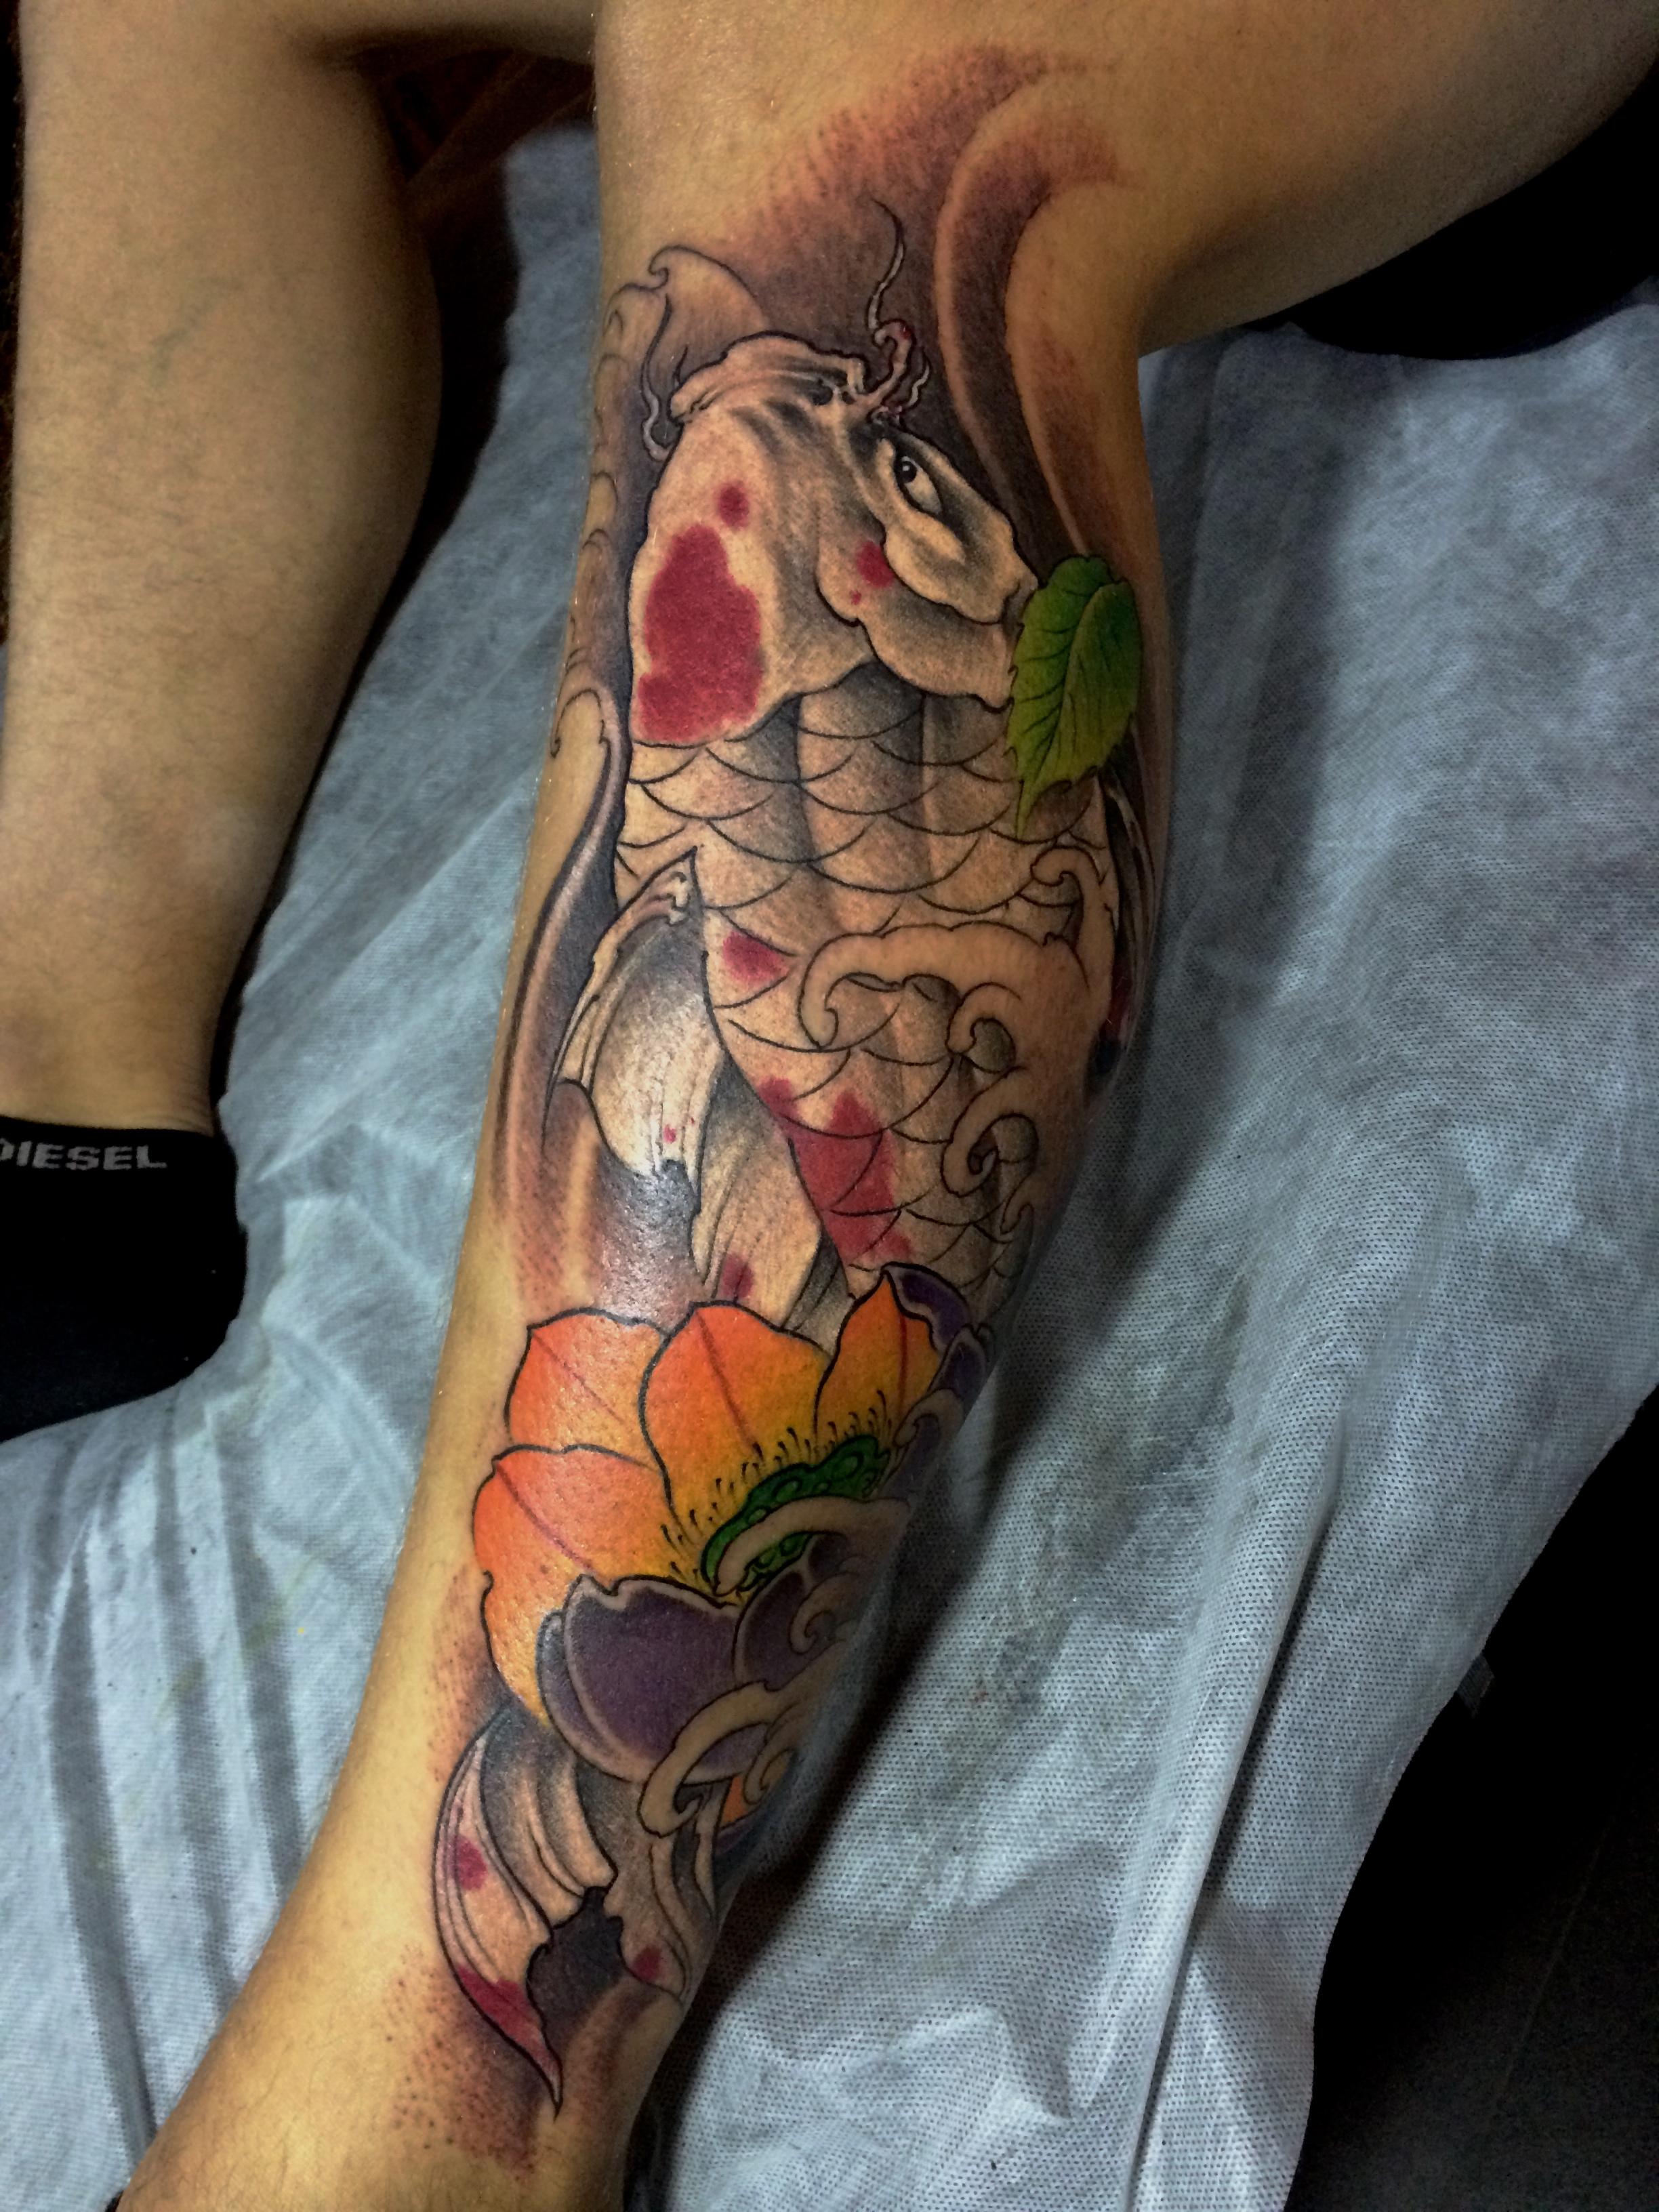 tatoeage kpo karper